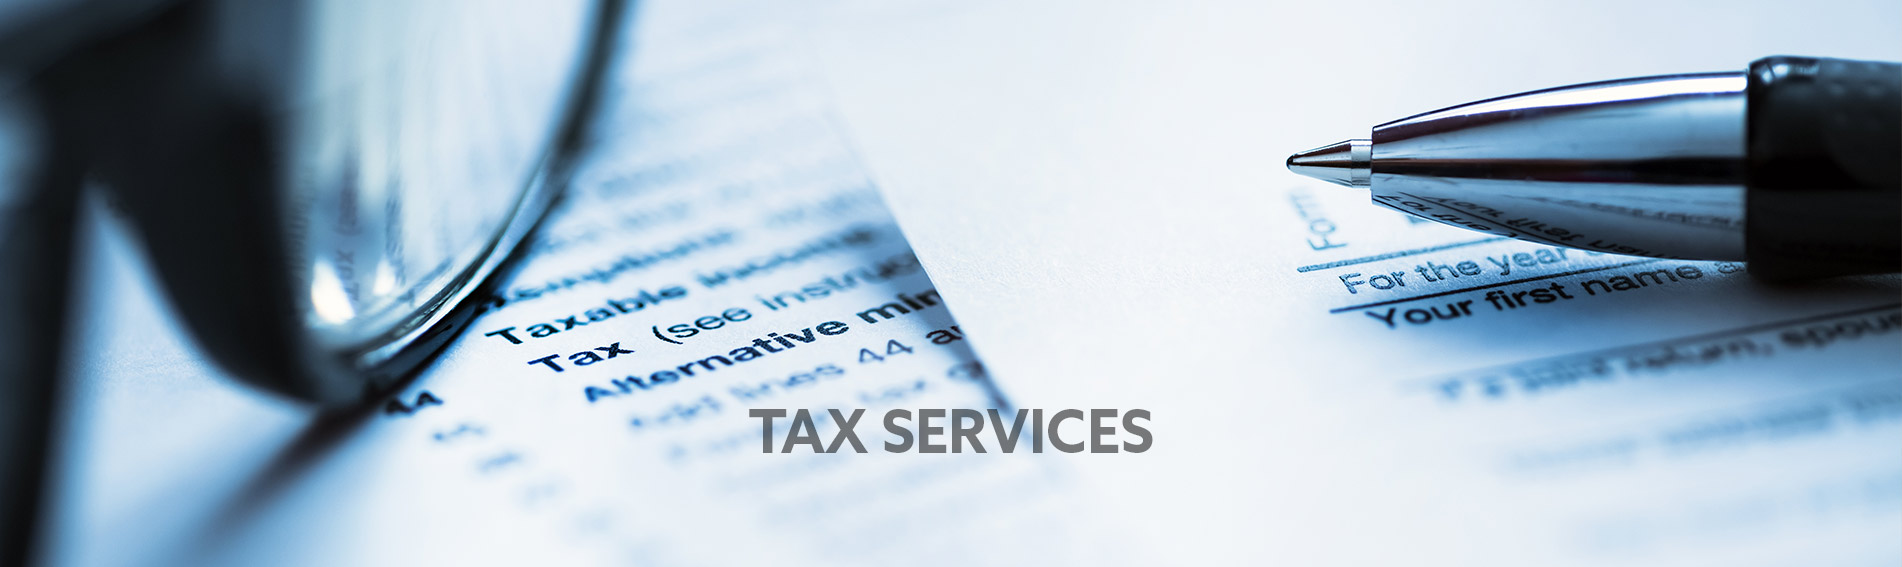 taxes-banner-1